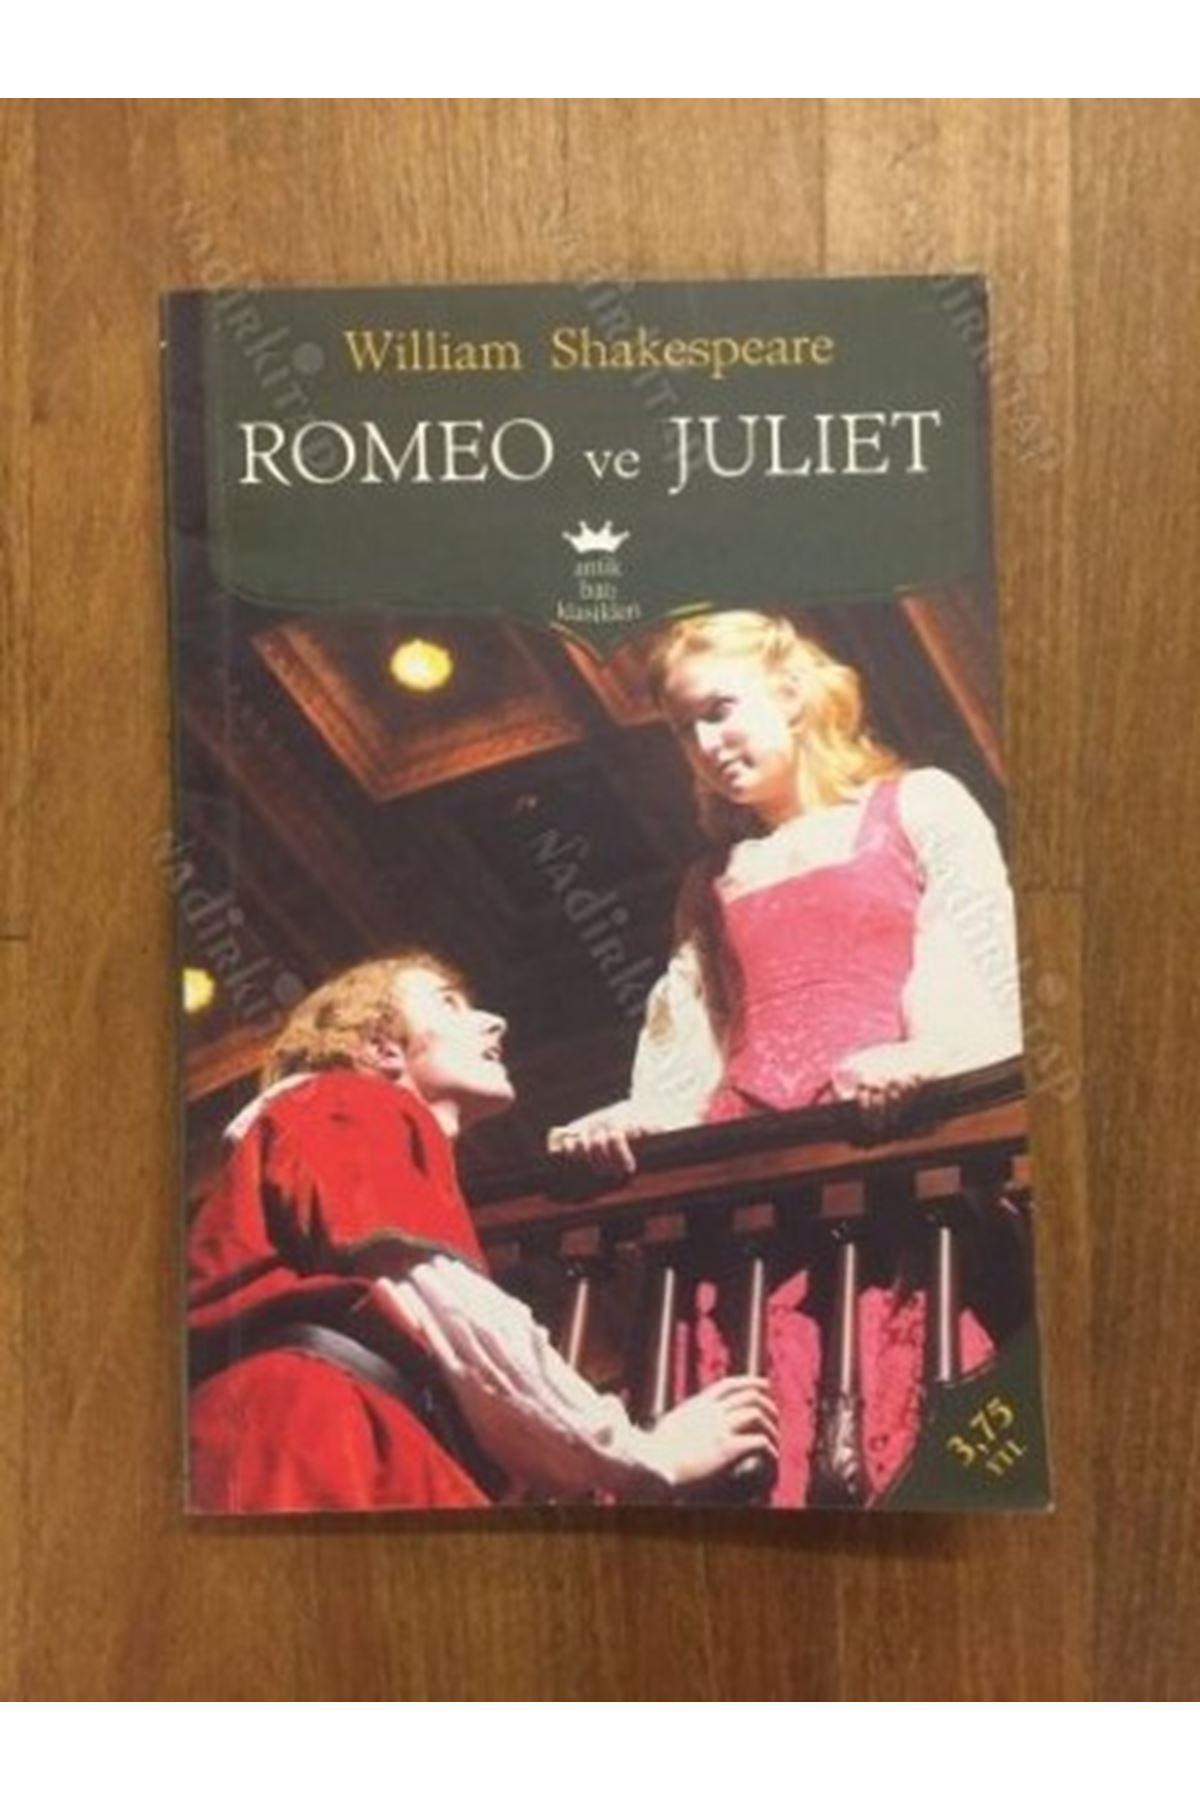 WILLIAM SHAKESPEARE - ROMEO VE JULIET